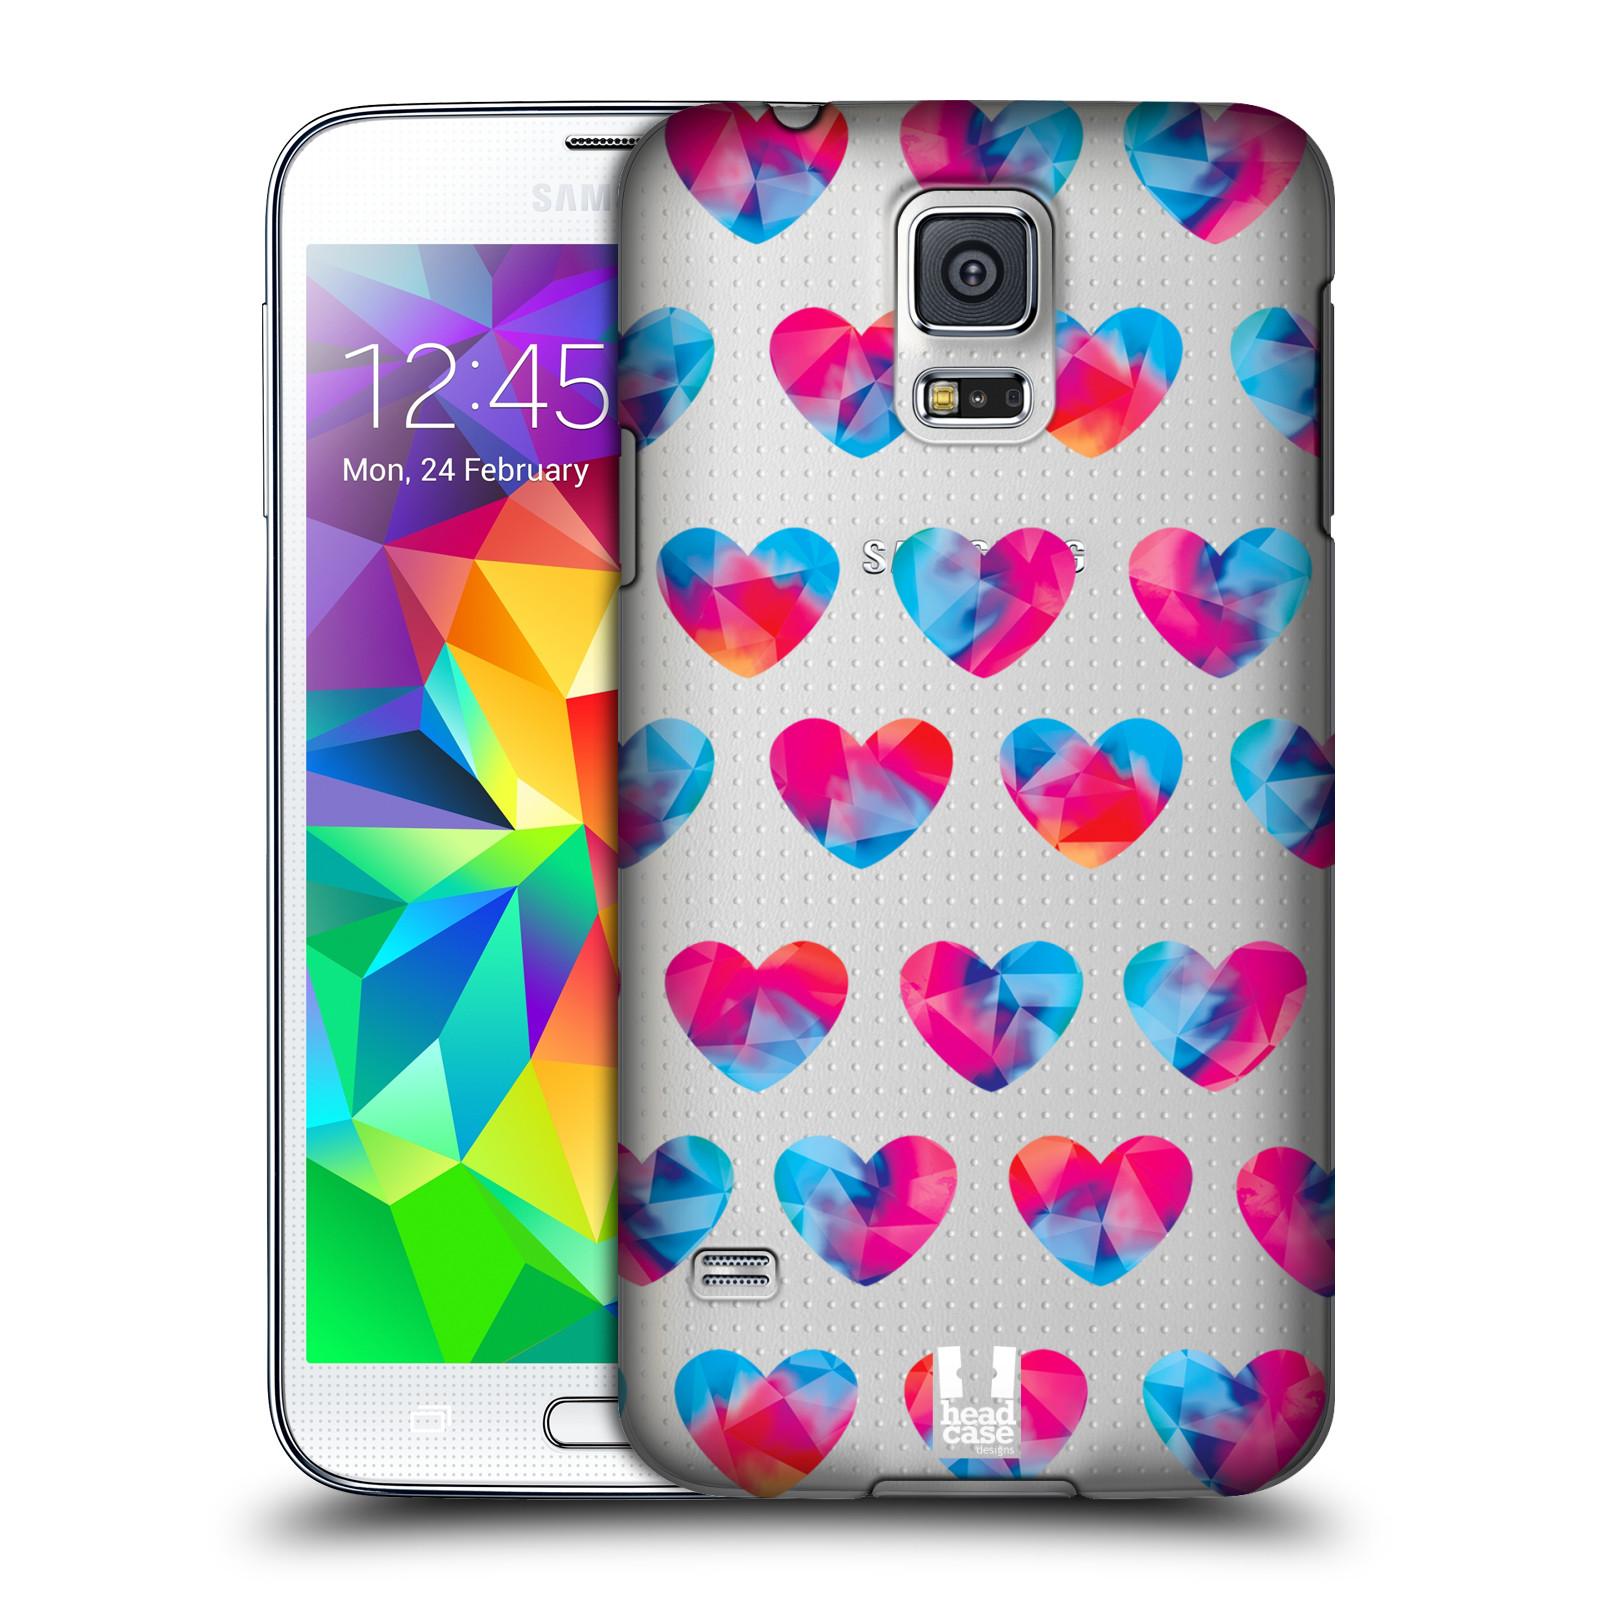 Plastové pouzdro na mobil Samsung Galaxy S5 - Head Case - Srdíčka hrající barvami